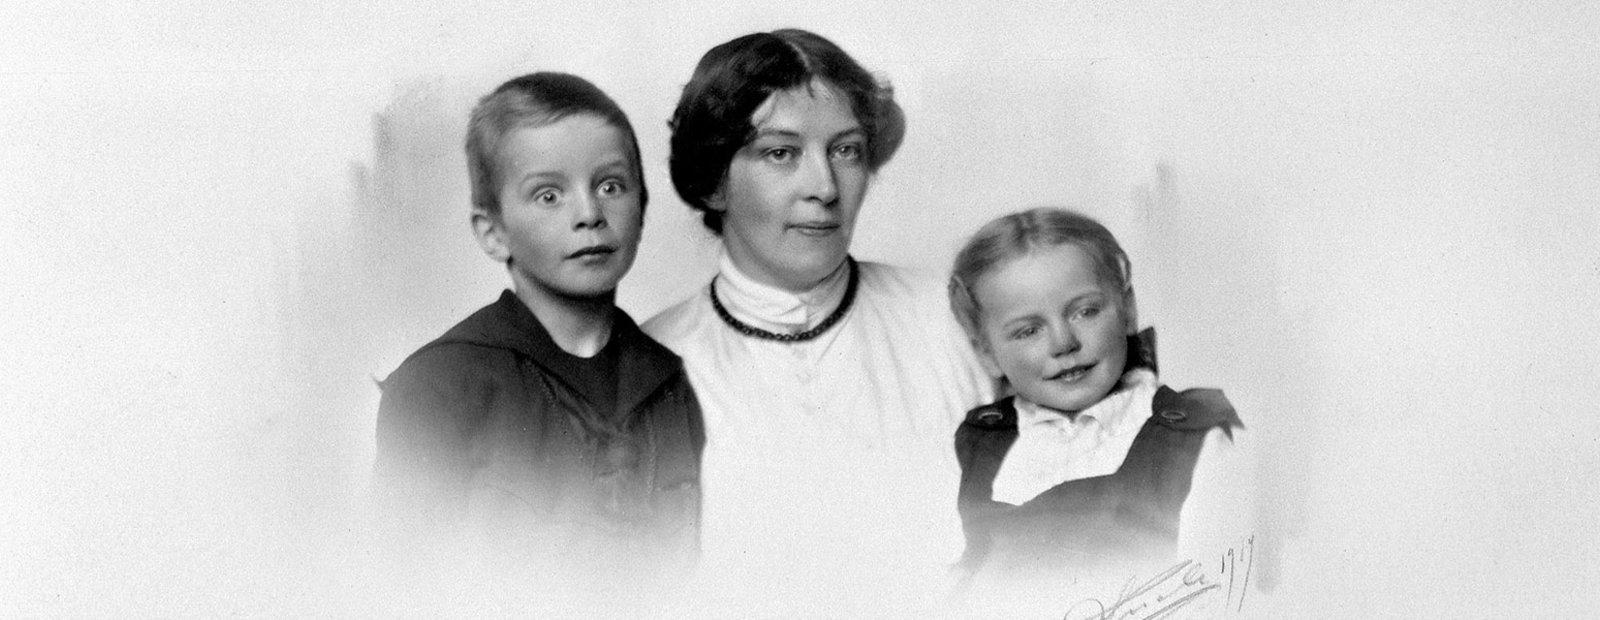 Anders C. Svarstad, Sigrid Undset, Maren Charlotte (Mosse) Svarstad